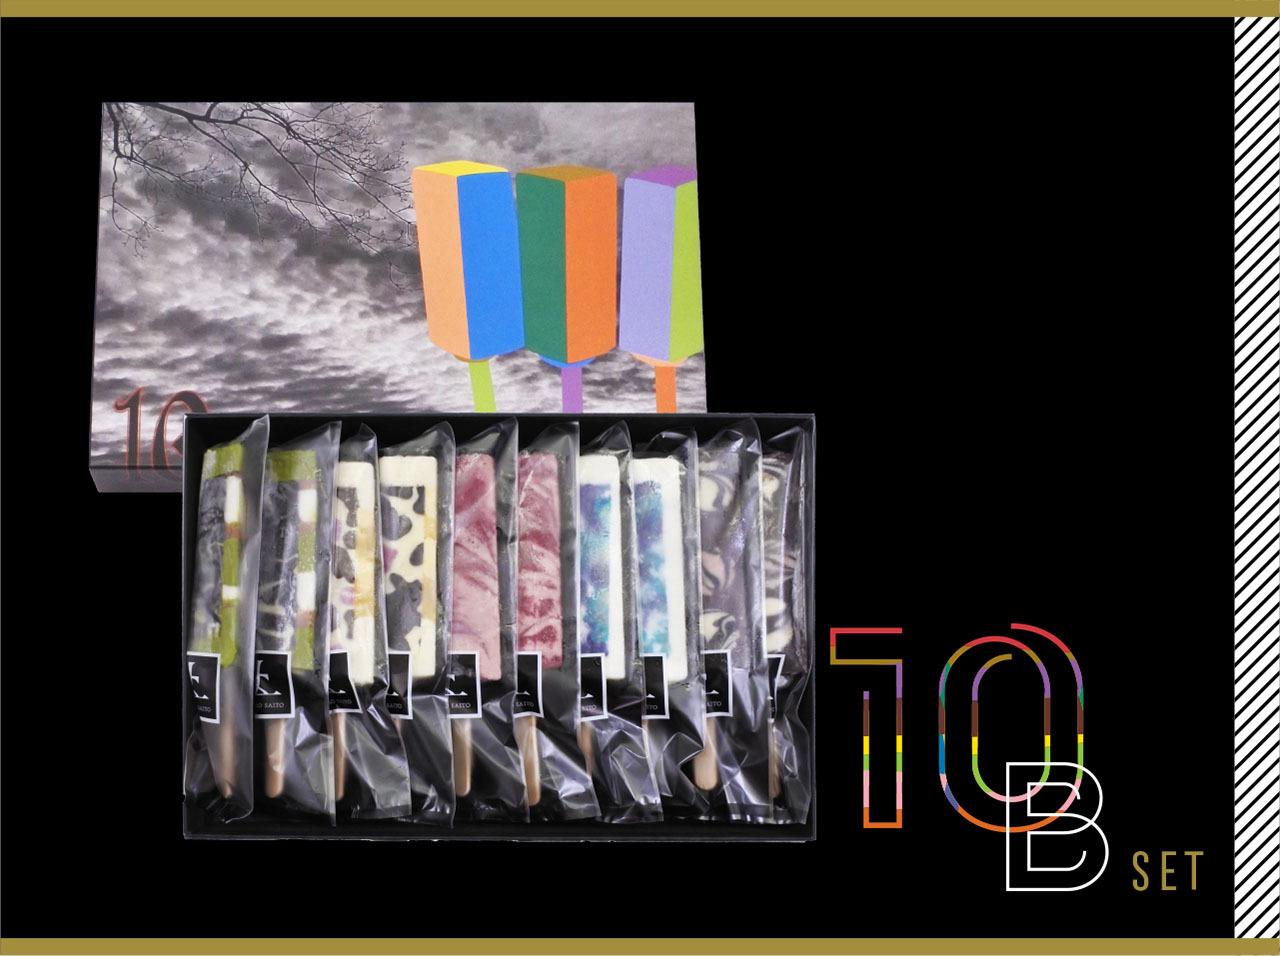 JOTAROアイスバー 5種 10本入Bセット